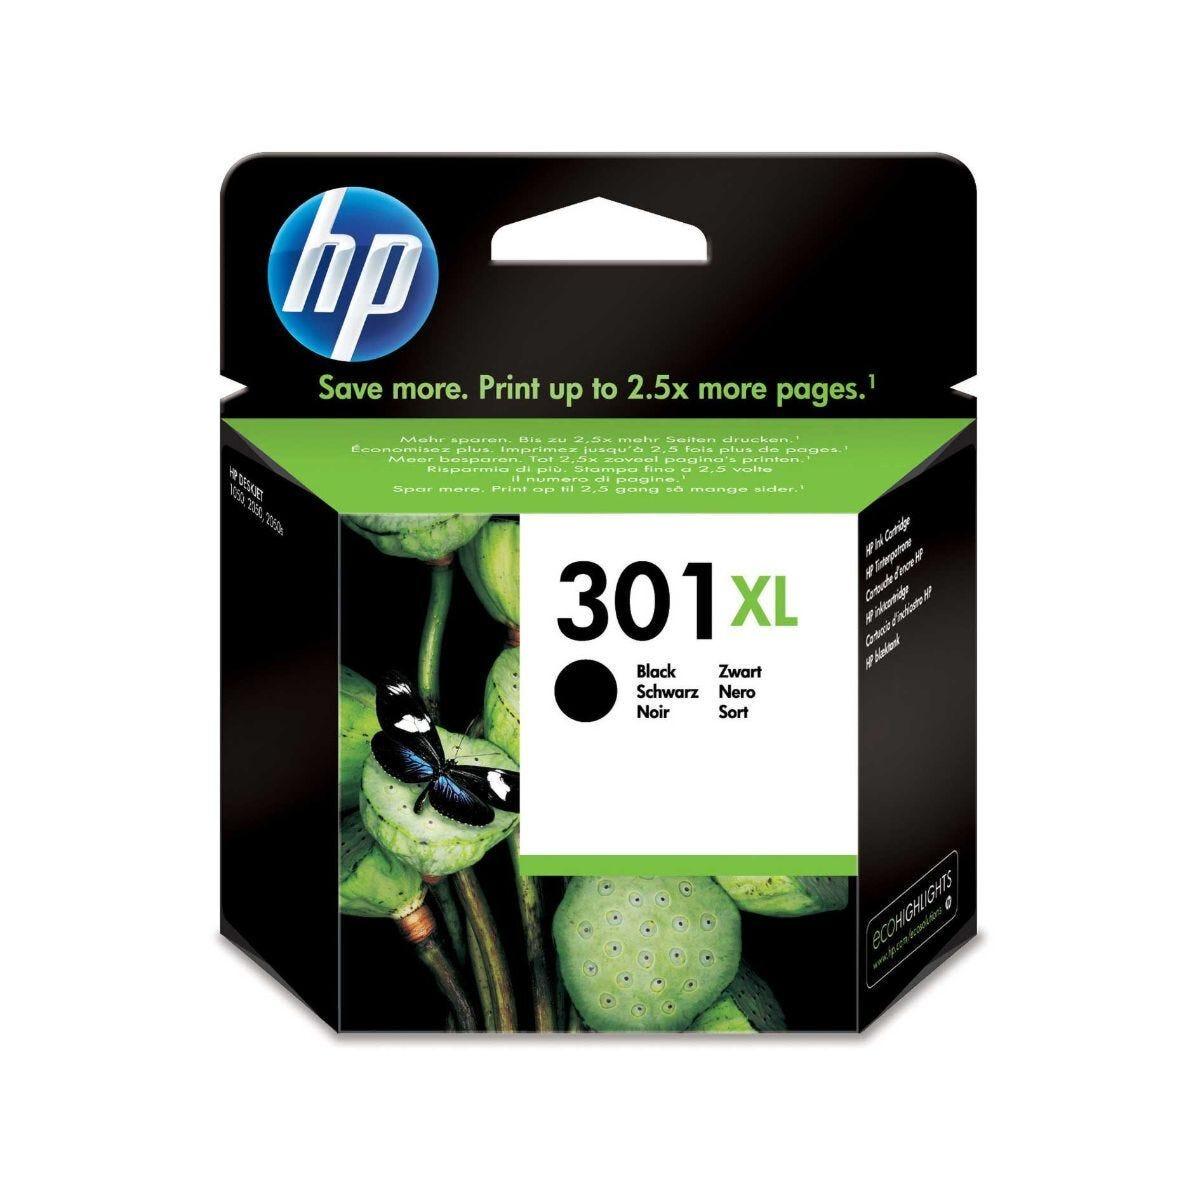 HP  301XL Inkjet Cartridge